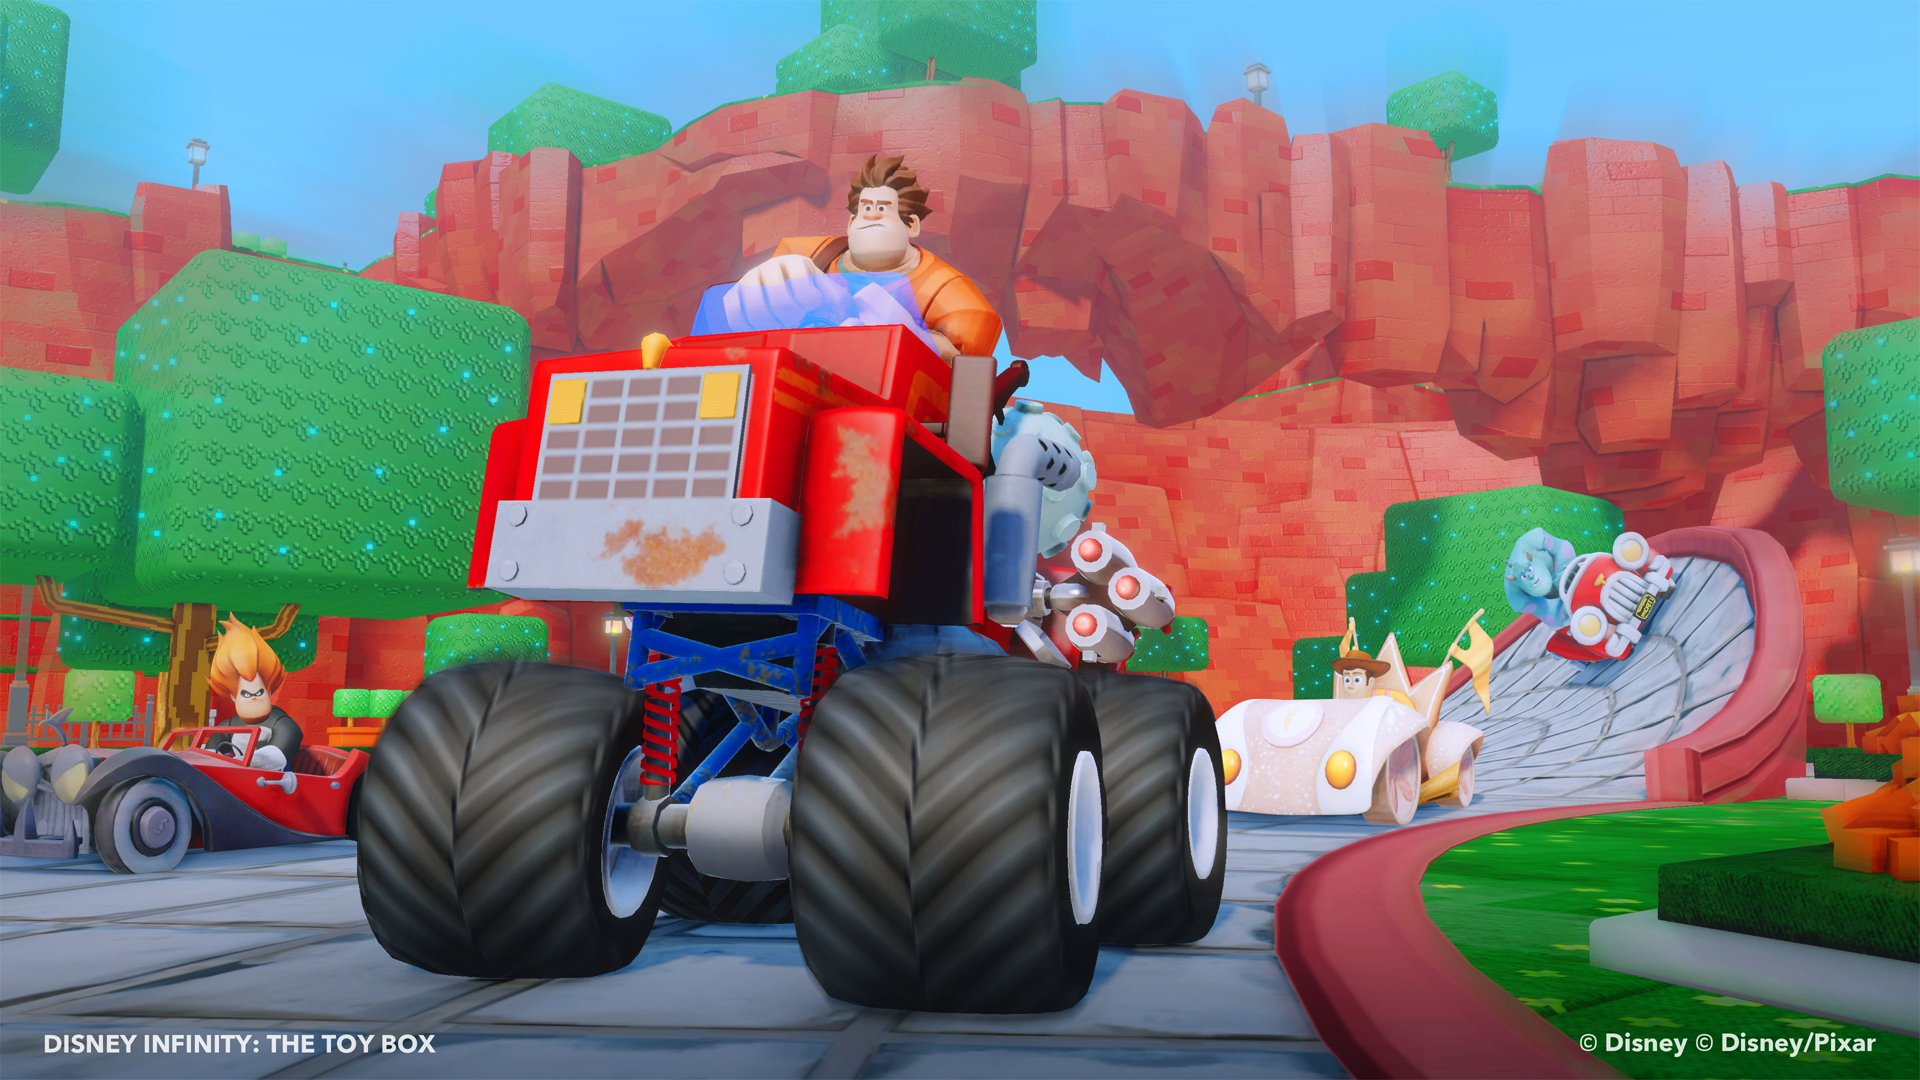 Wreck it ralph disney infinity wiki fandom powered by - Disney Infinity Holiday Characters 5 Jpg